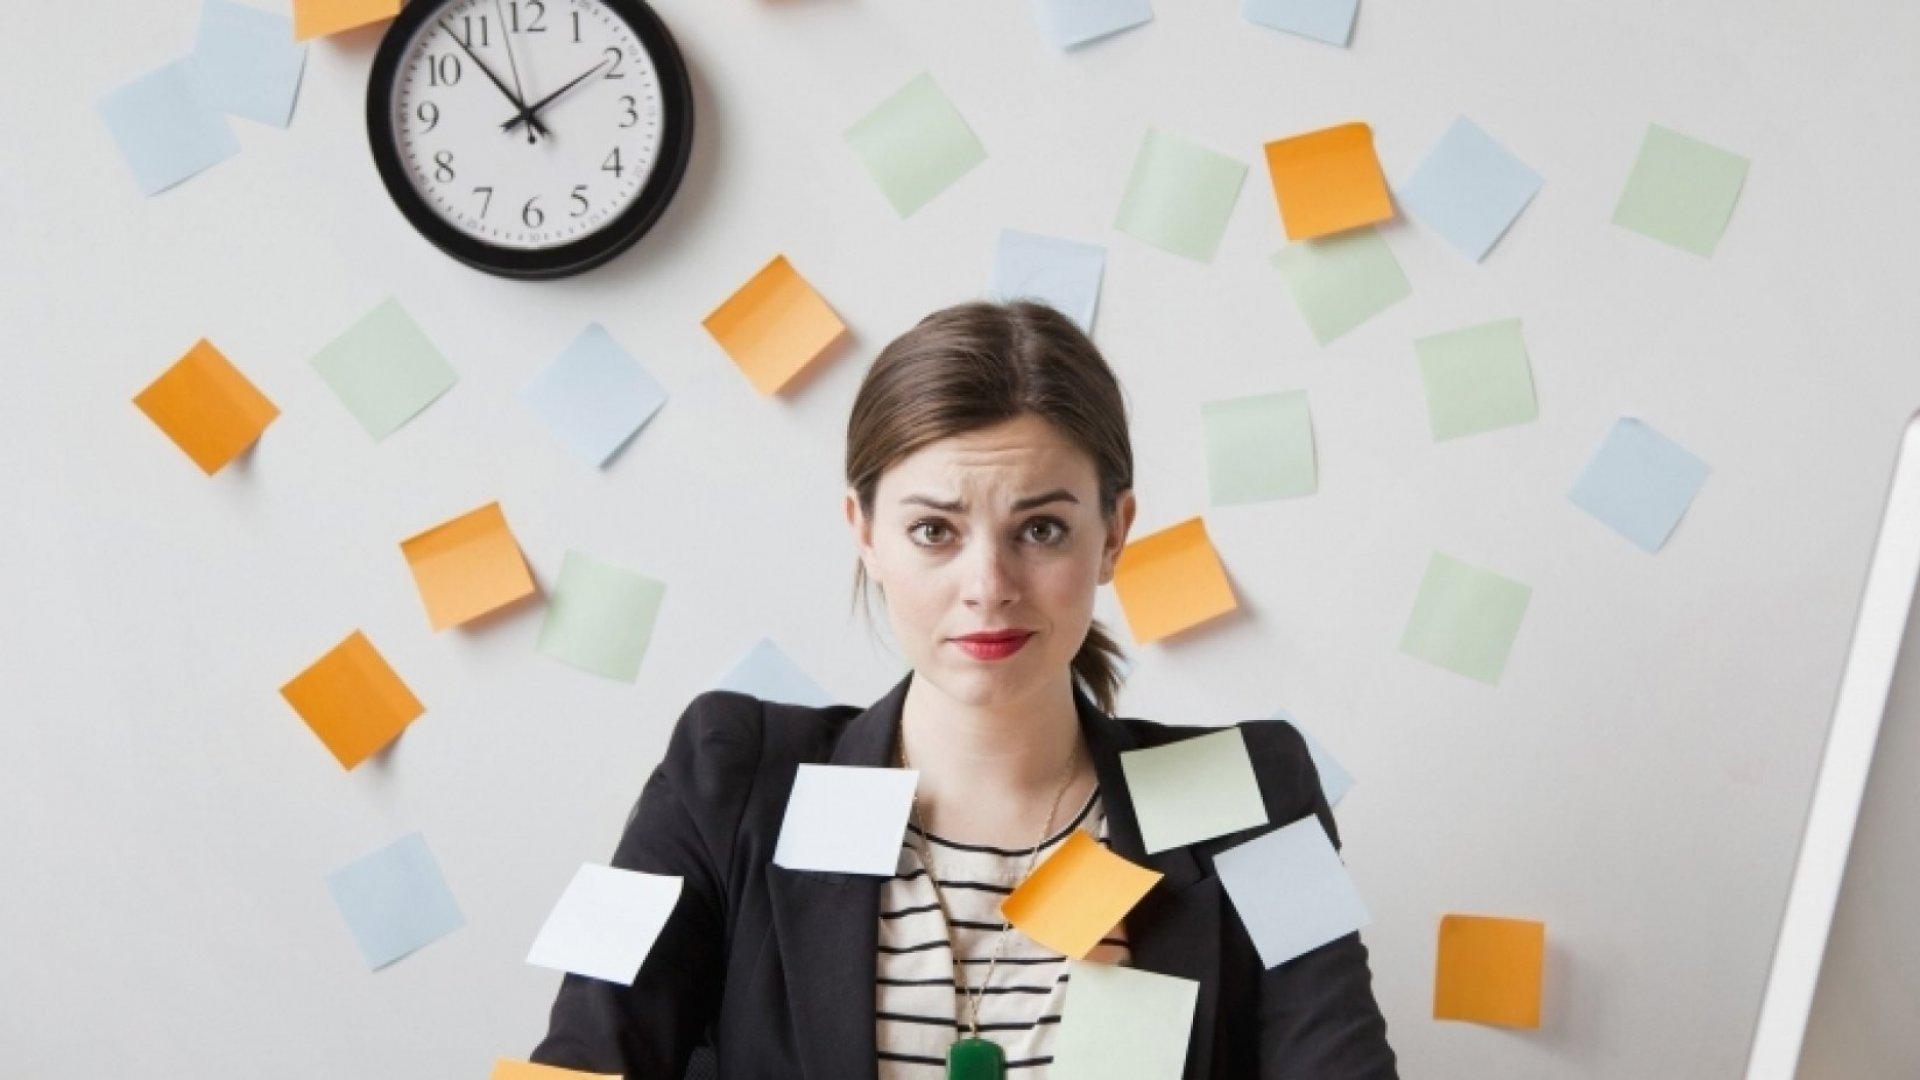 Forget Time Management; Focus on Stress Management